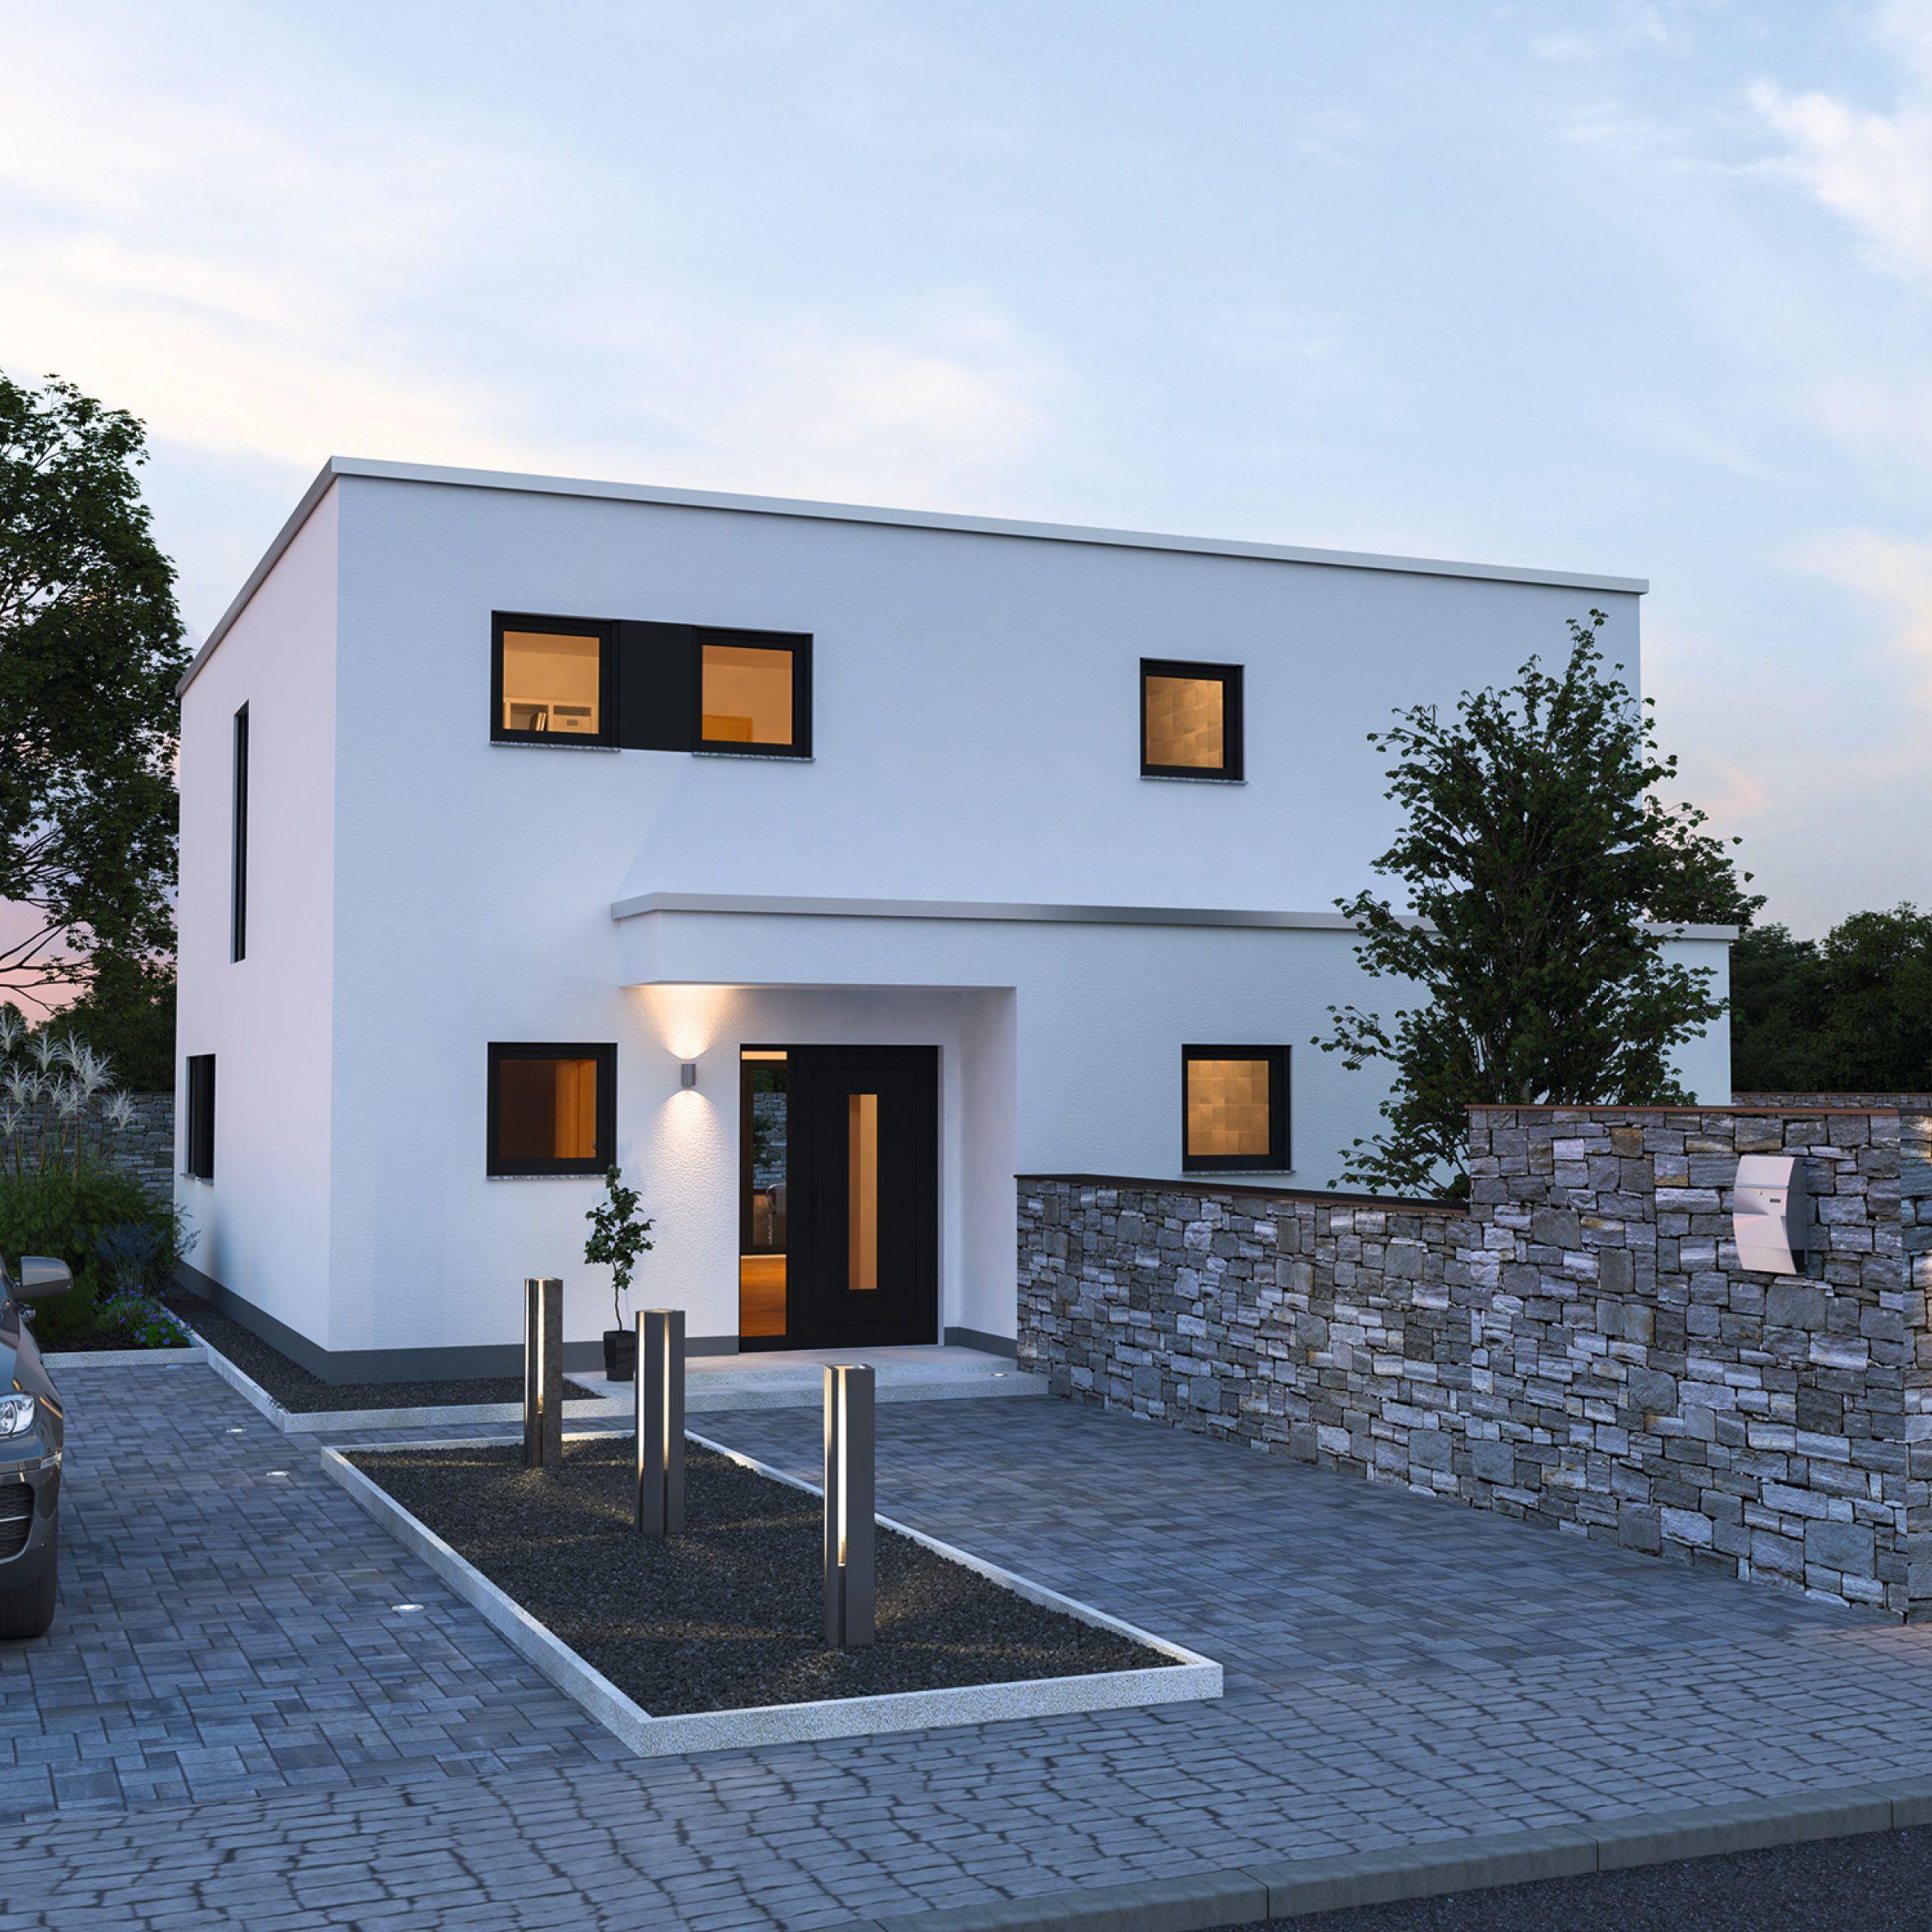 Alea 168 - schlüsselfertiges Massivhaus #ausbauhaus #schlüsselfertig ...